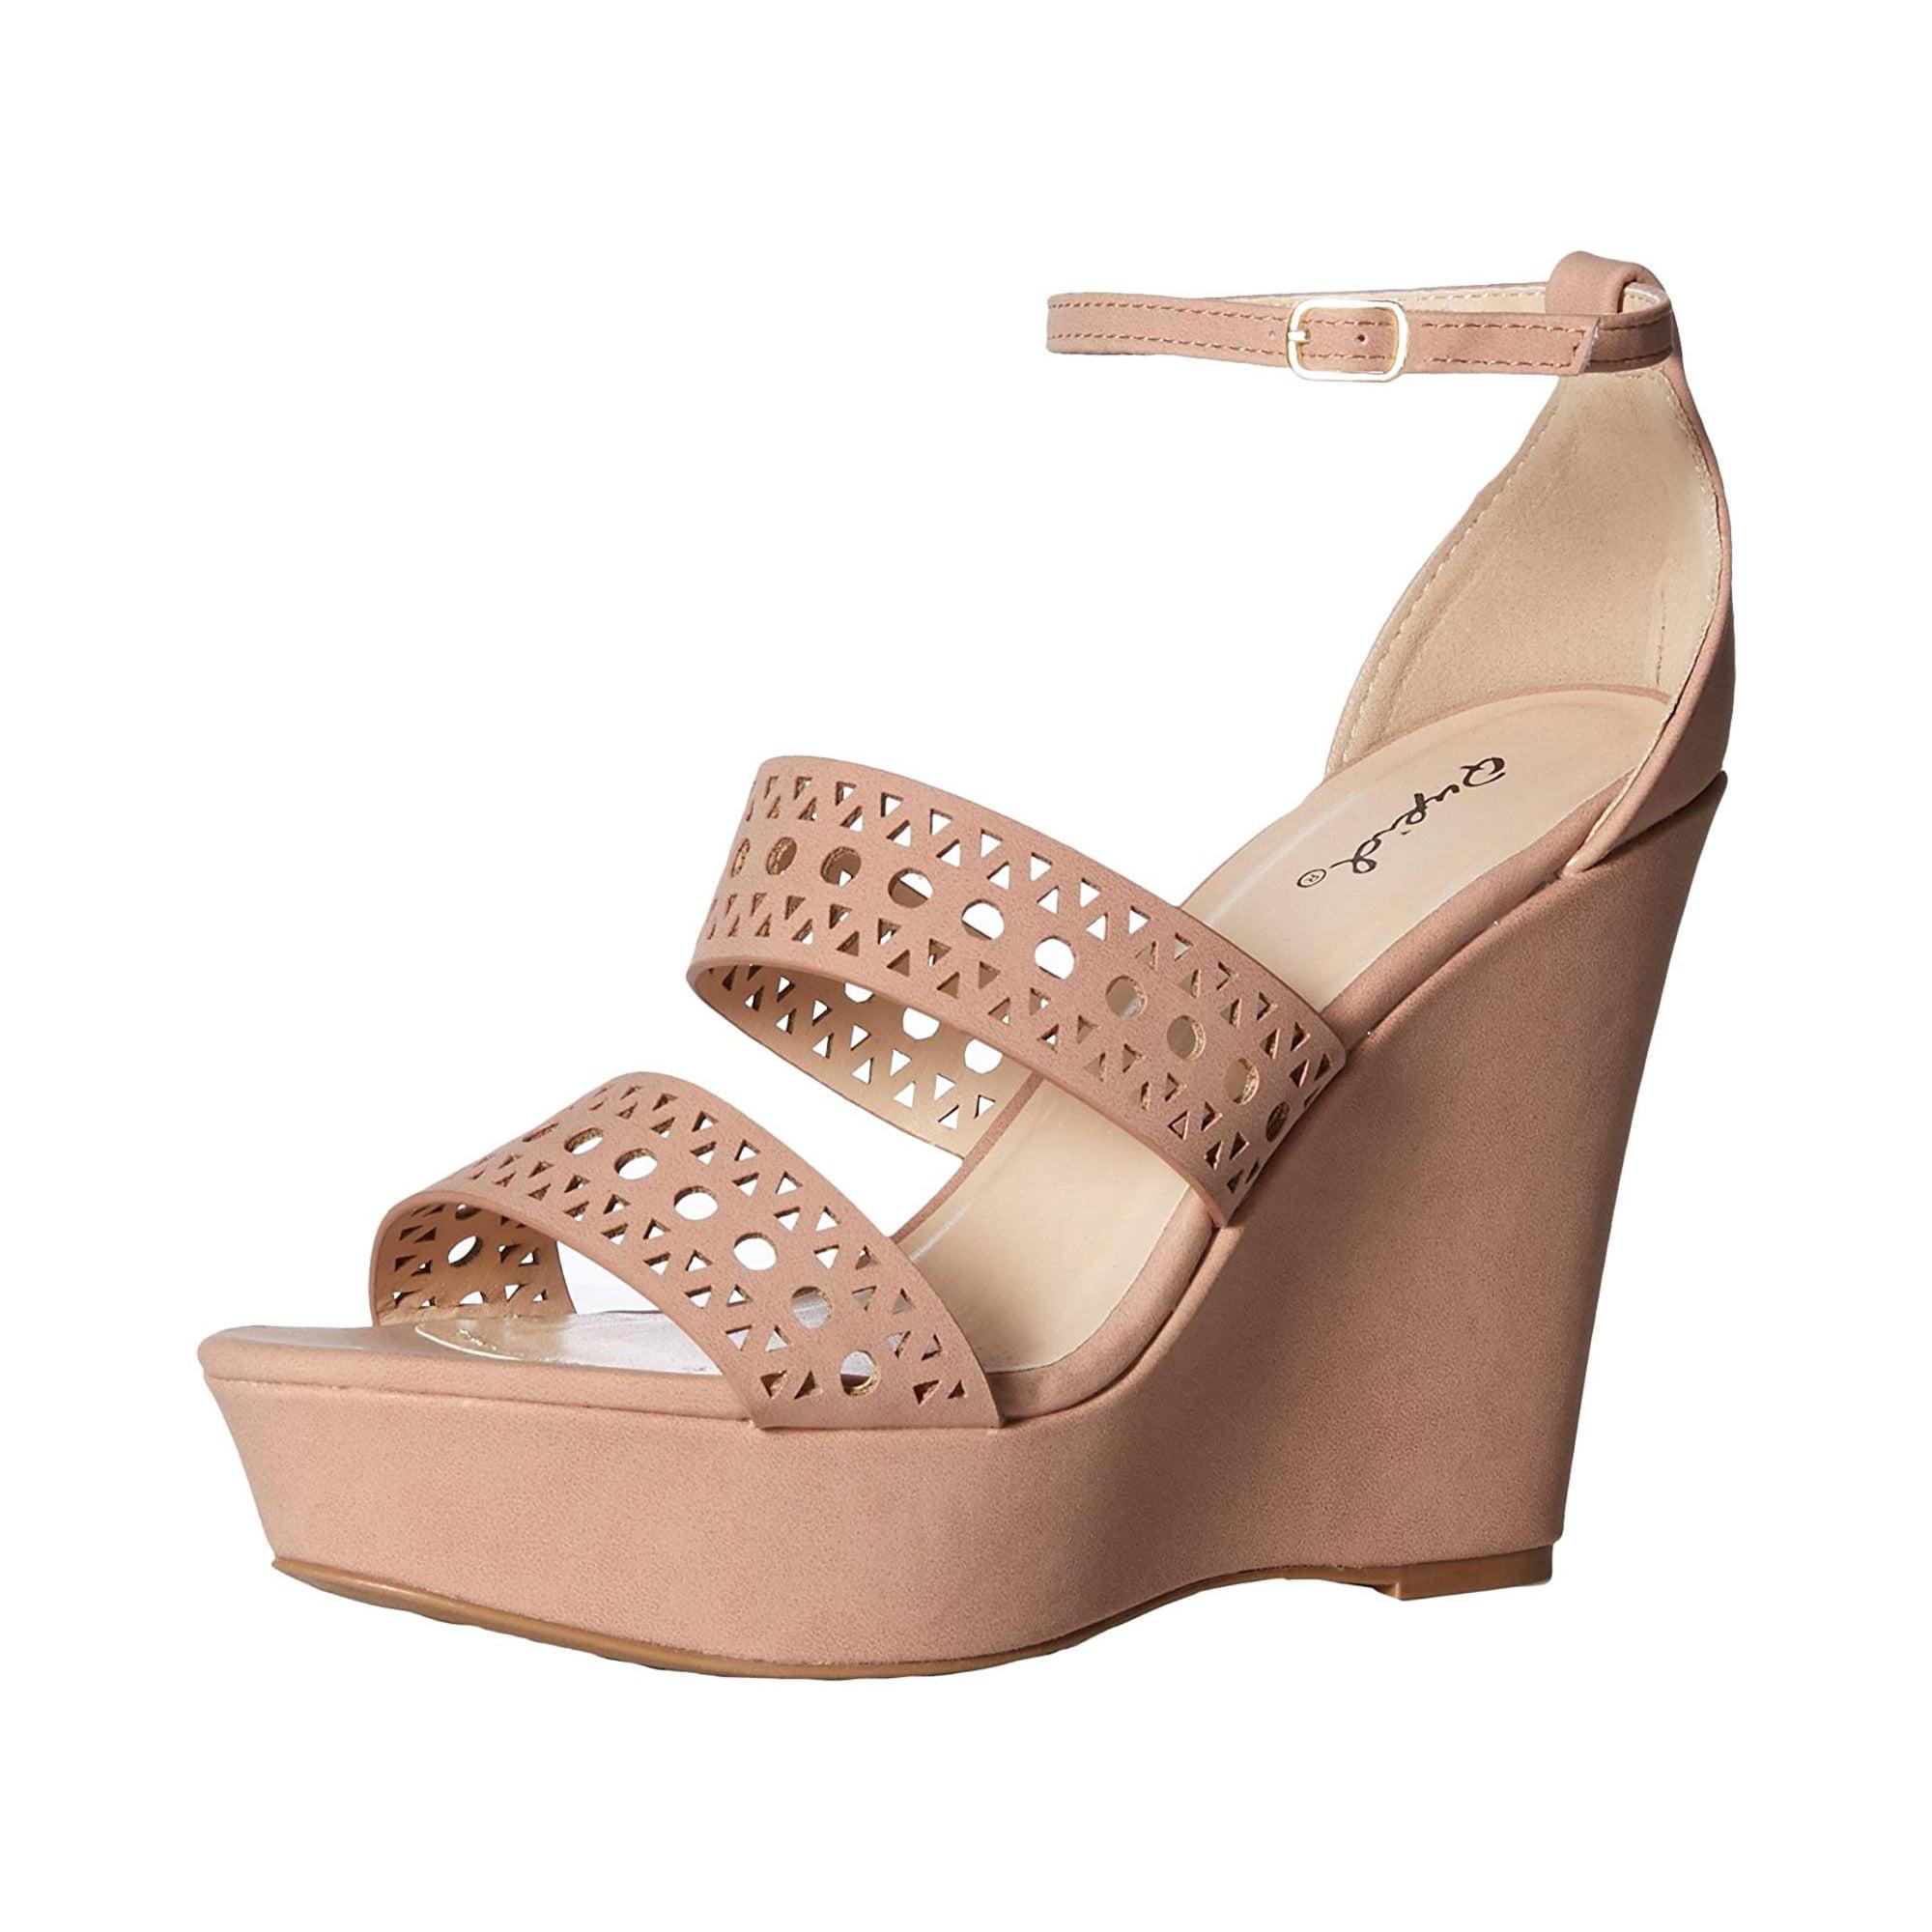 1a0772fce4e Qupid Women's Espadrille Wedge Sandal | Walmart Canada